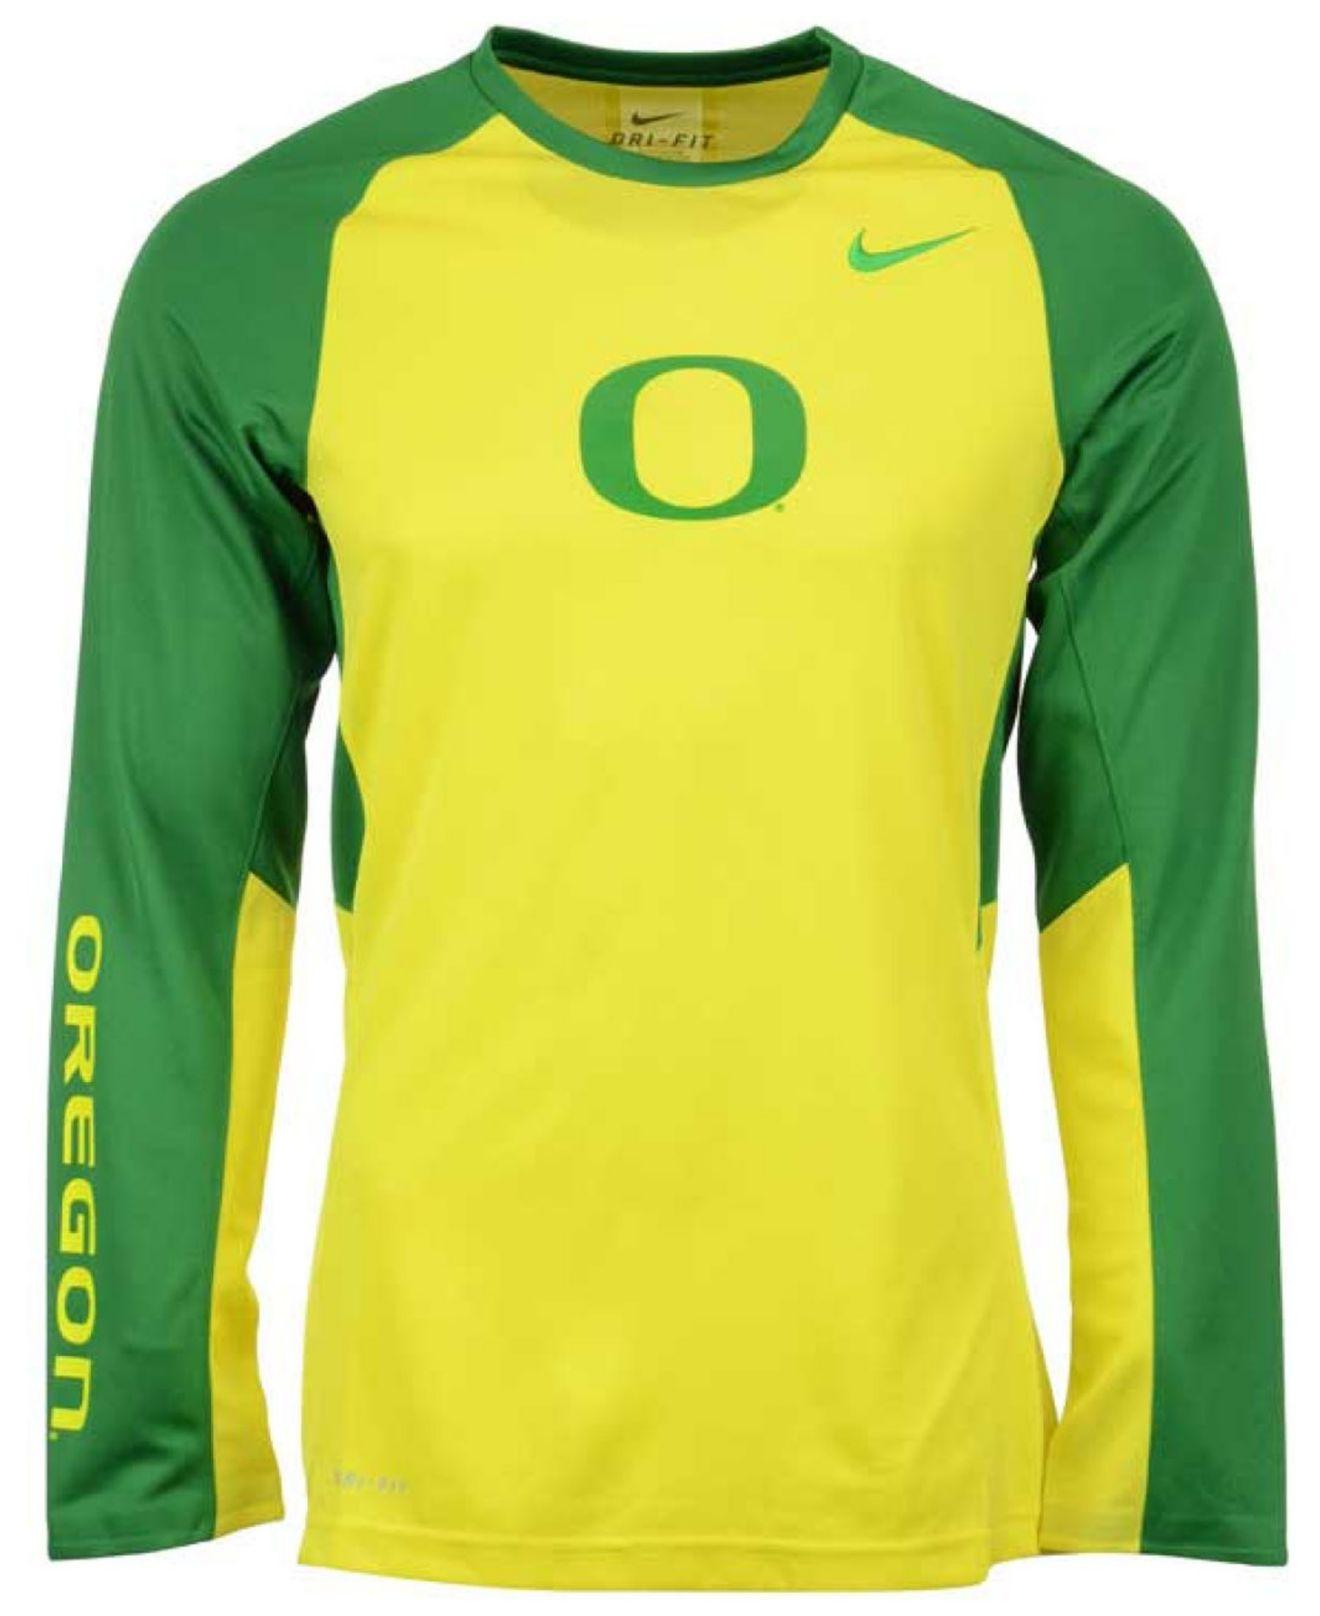 2373bda3 Nike Men's Long-sleeve Oregon Ducks Elite Shootaround T-shirt in ...